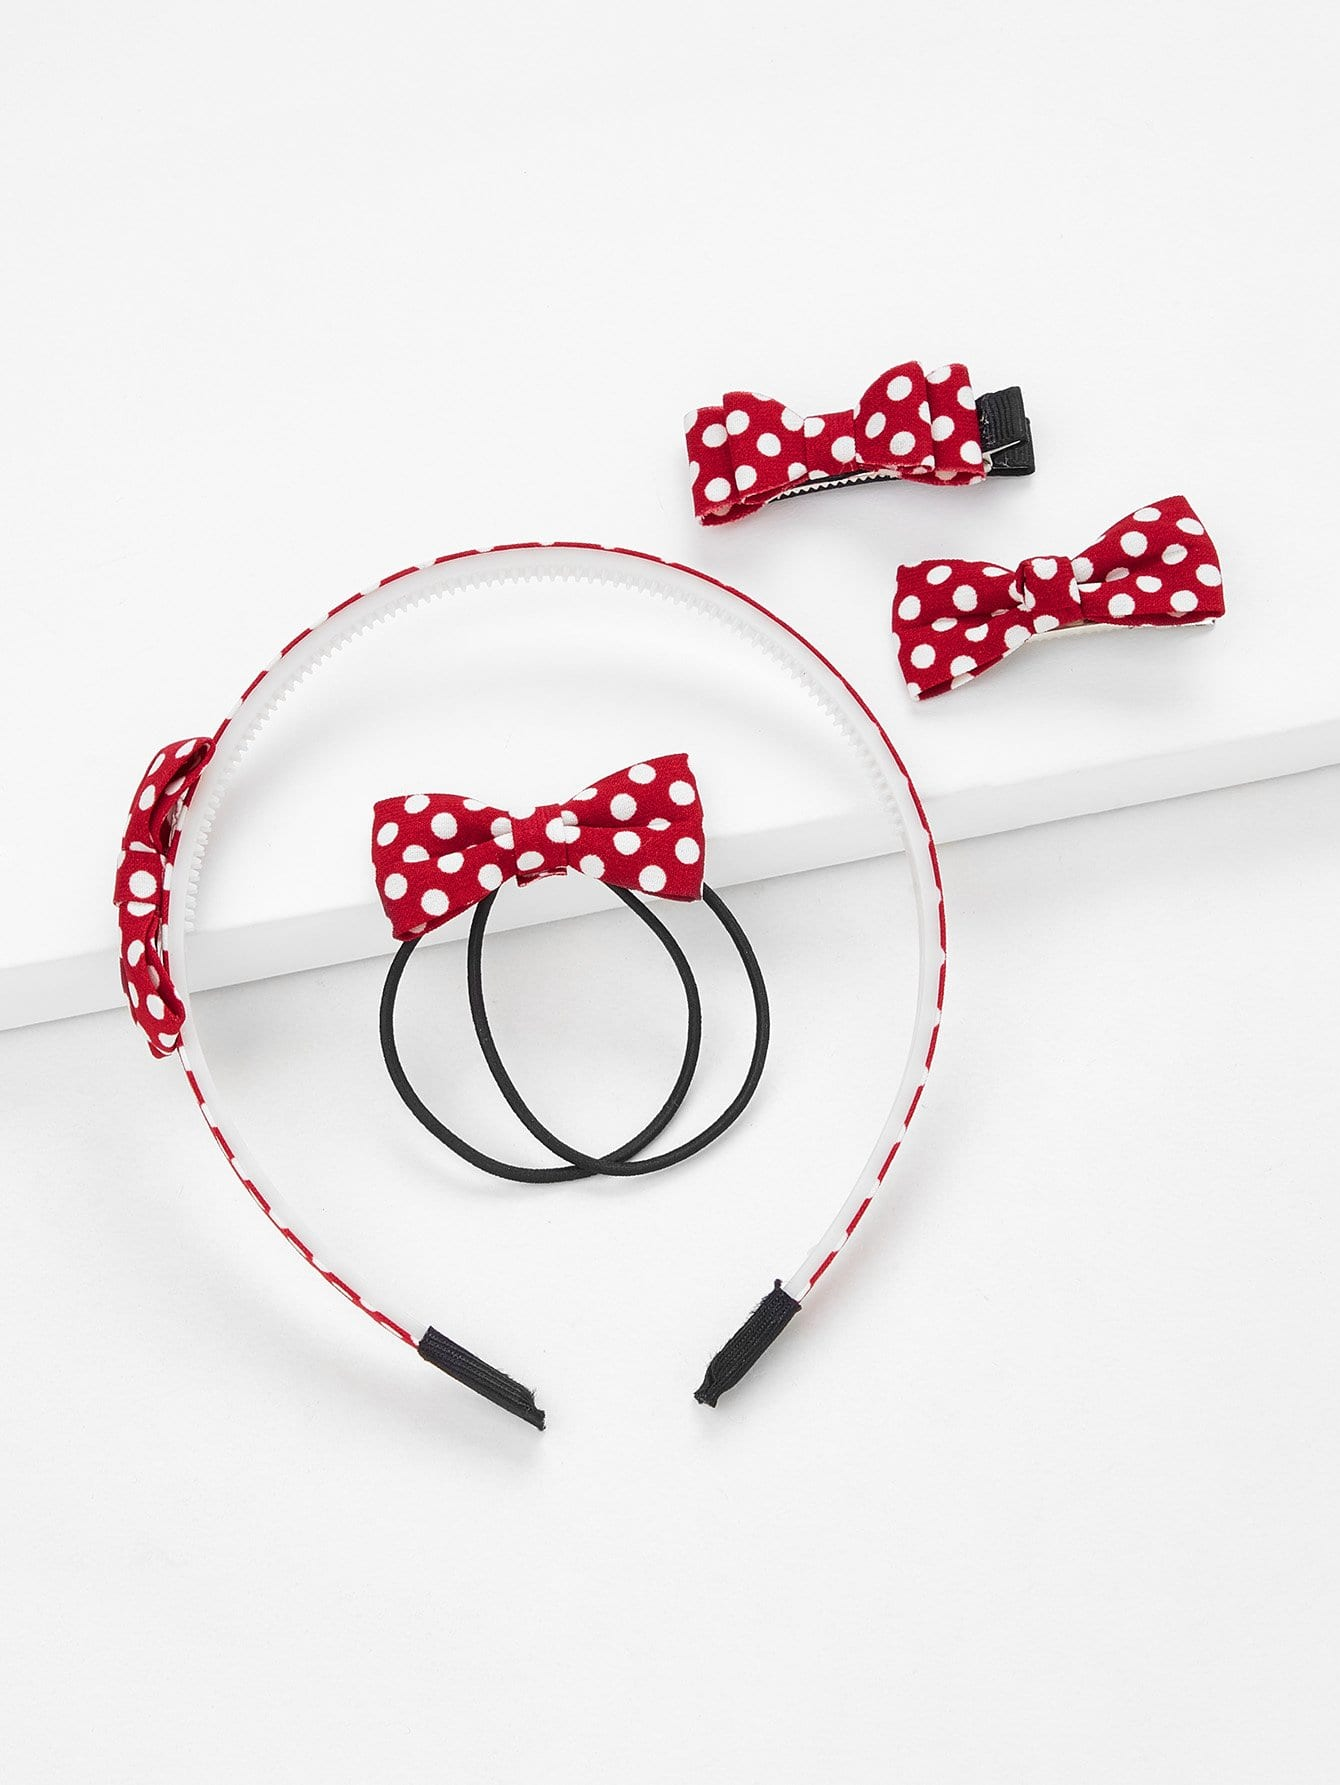 Аксессуары для волос Bowknot Polka Dot 5pcs, null, SheIn  - купить со скидкой